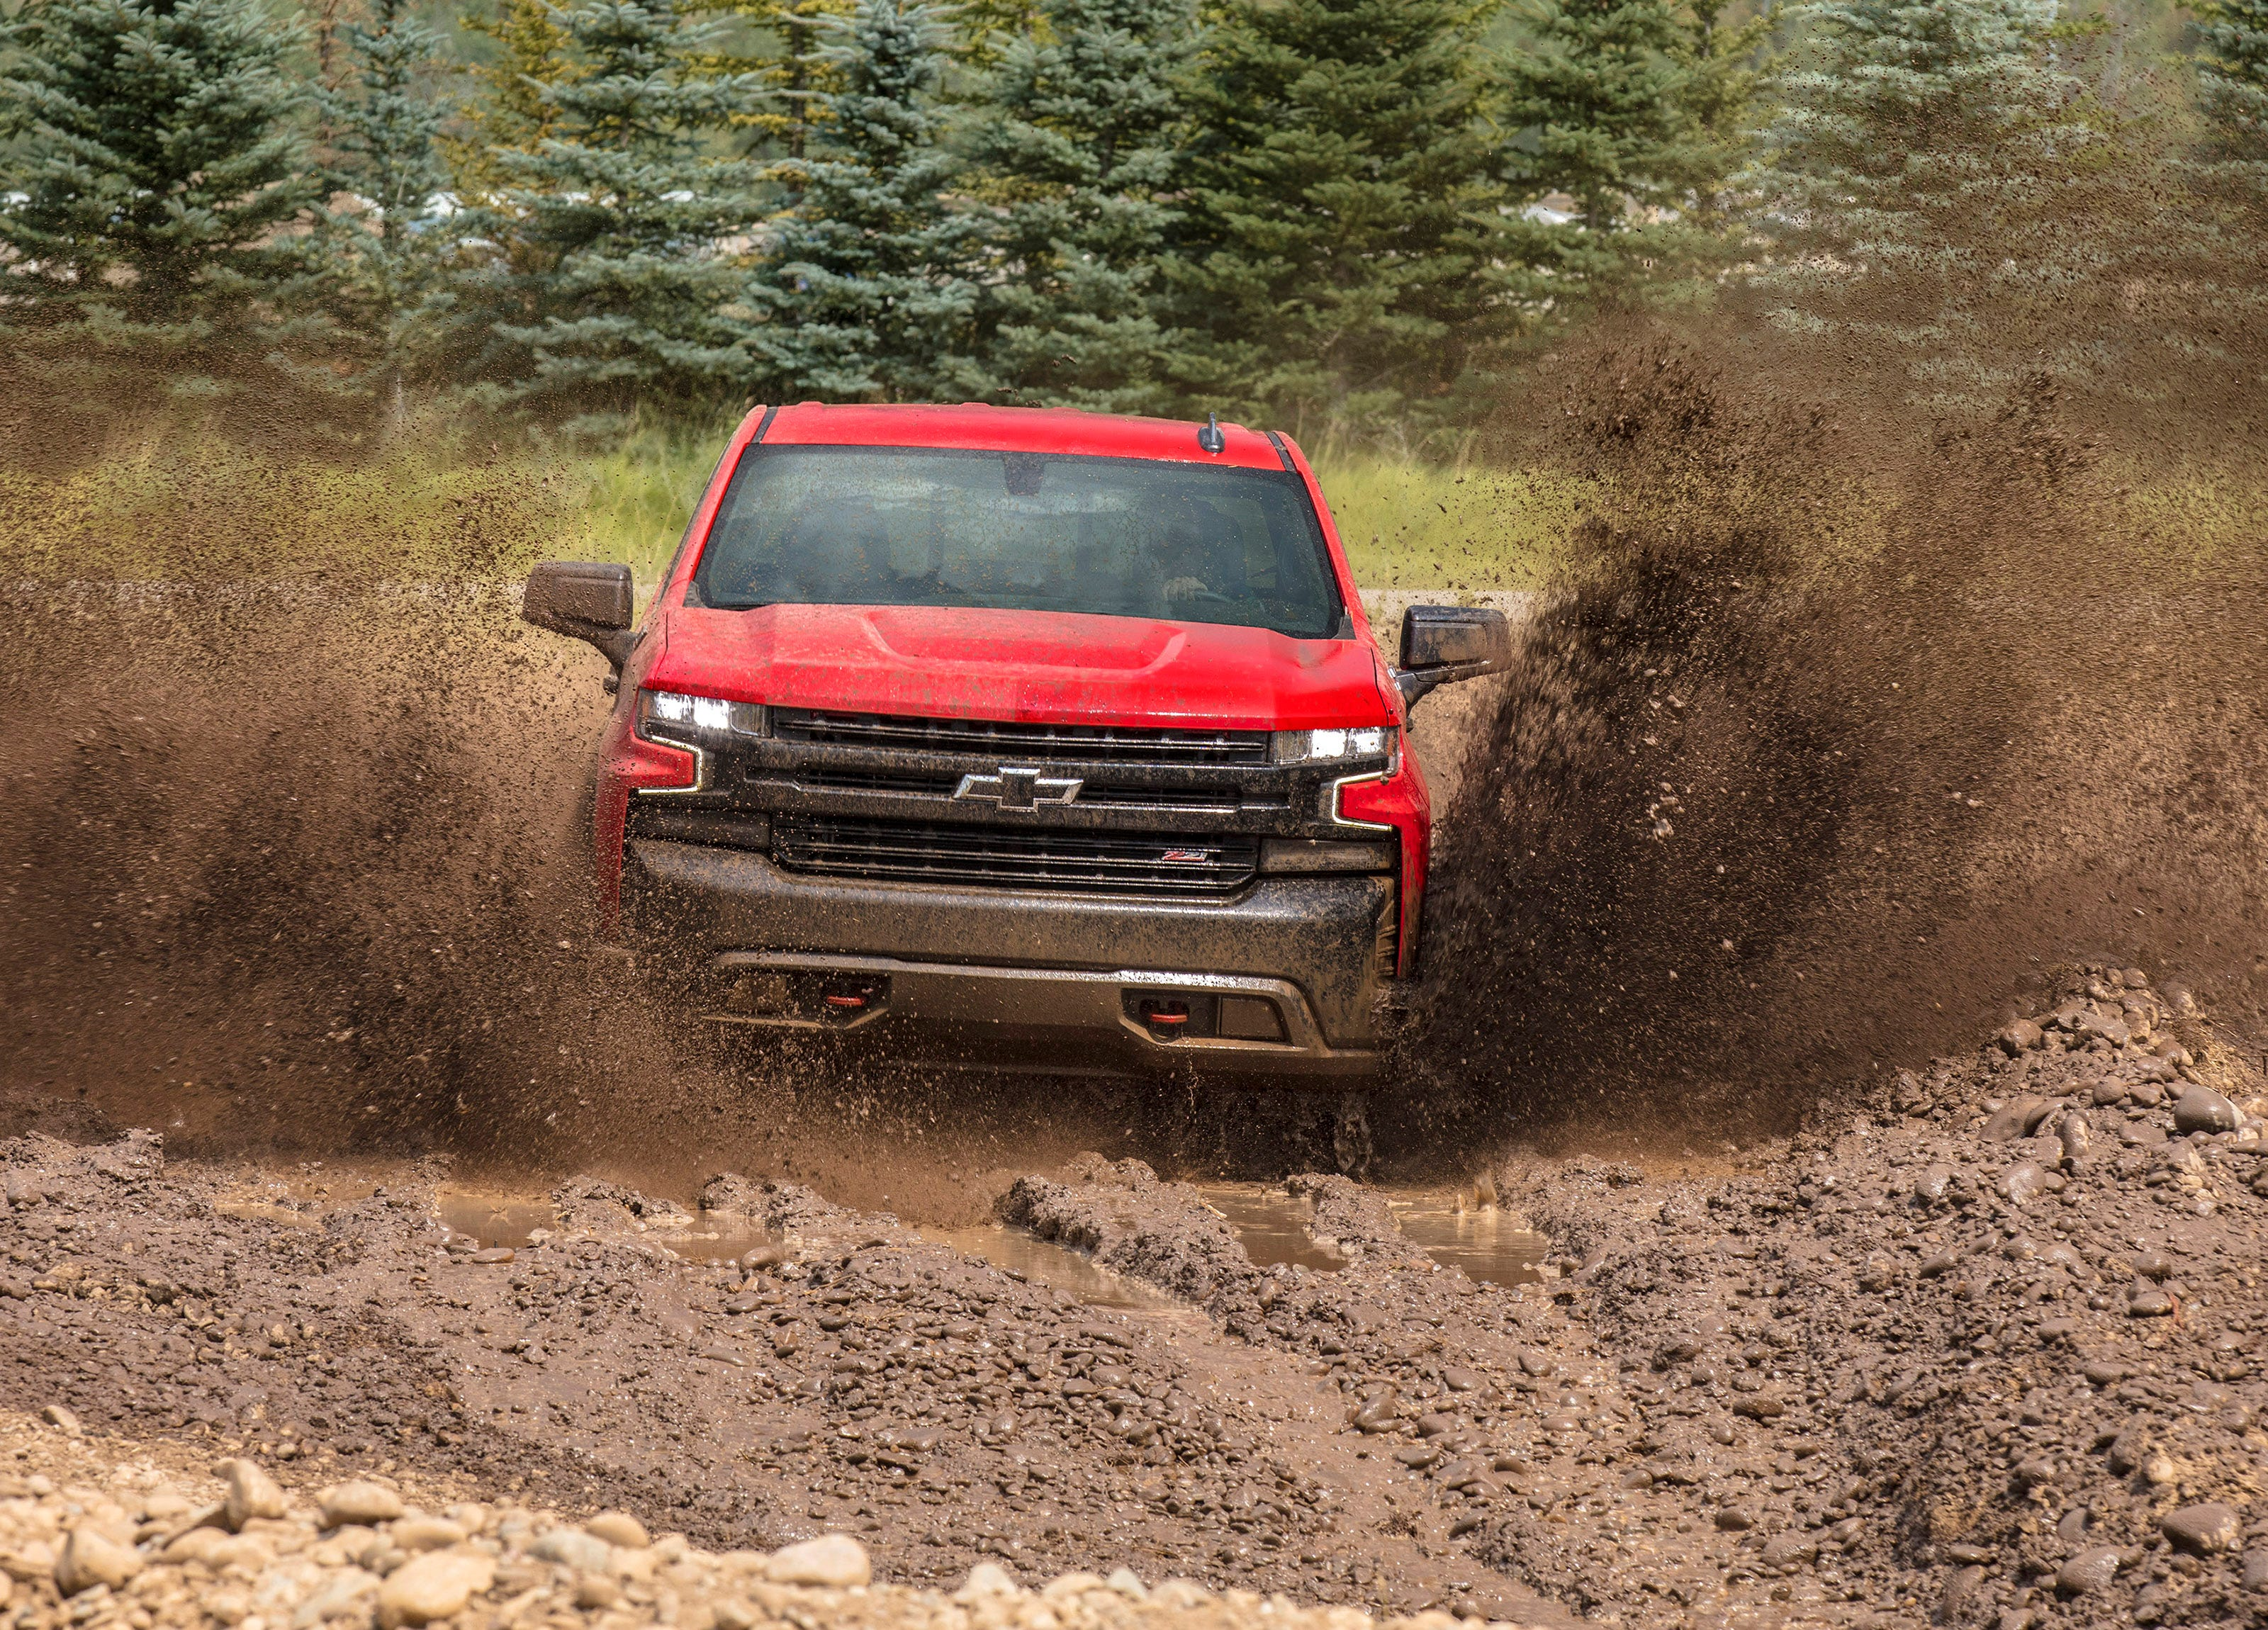 2019 Chevrolet Silverado Trailboss 067